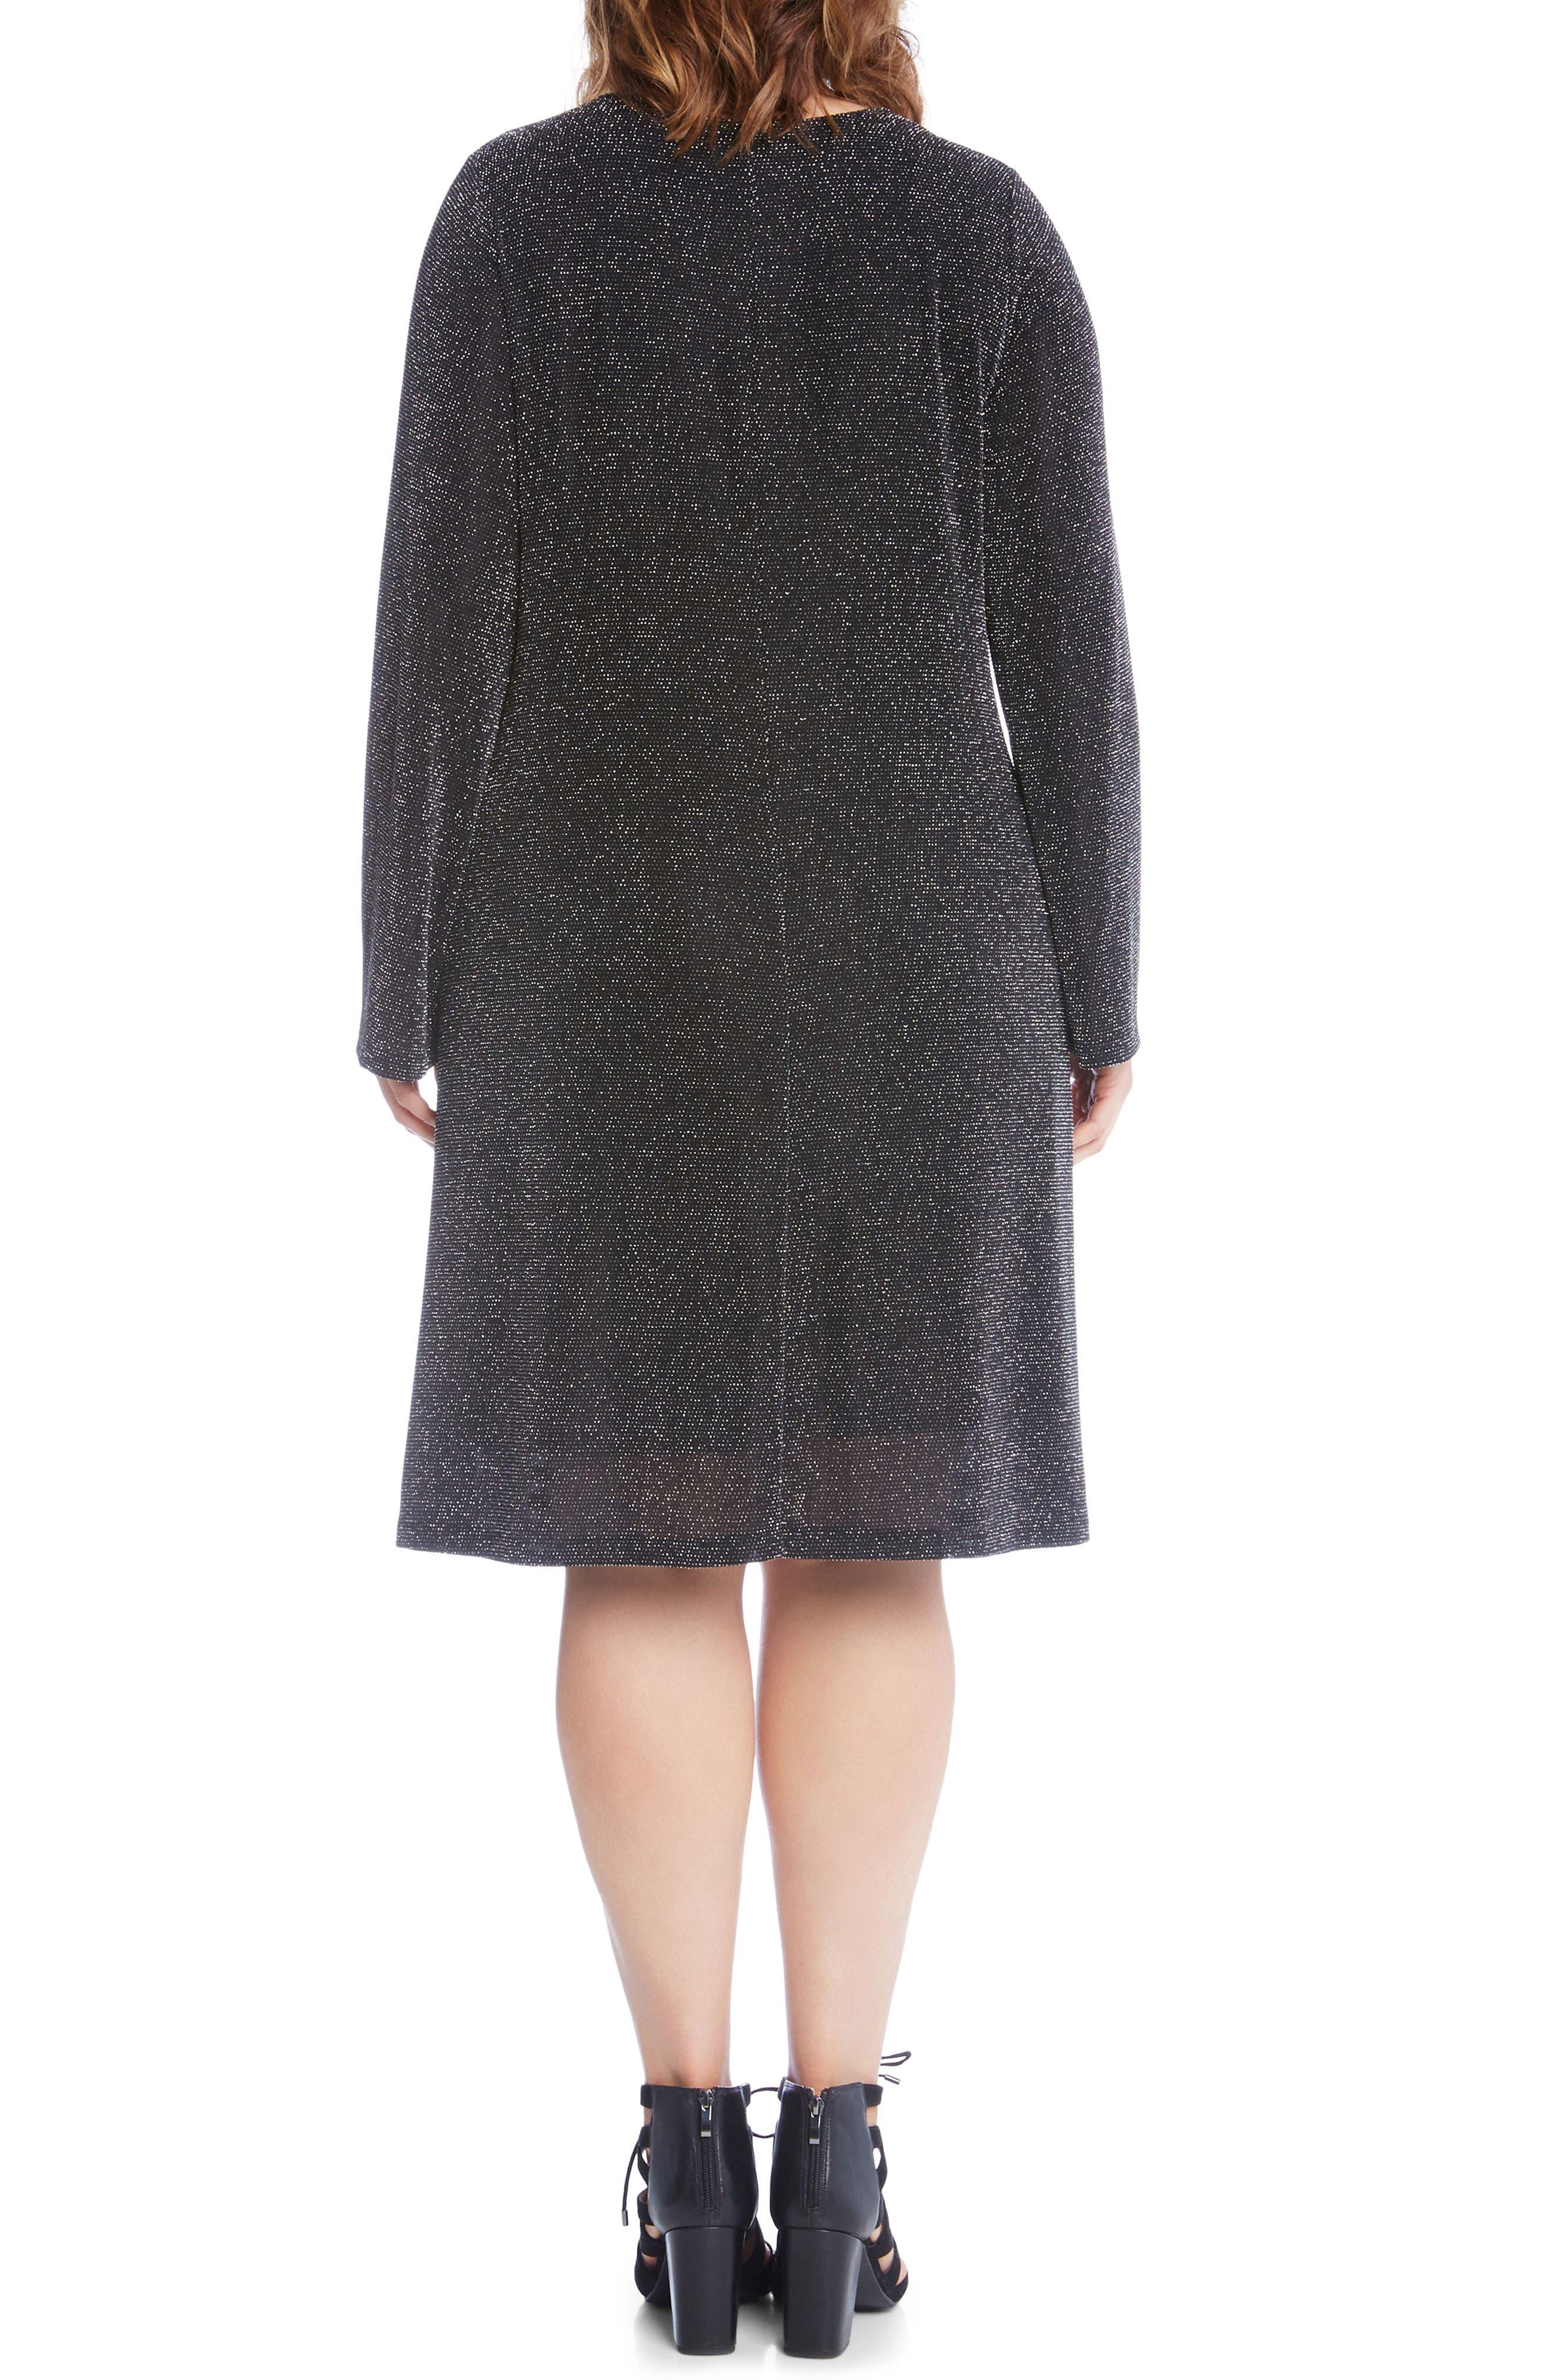 Taylor Sparkle Knit Dress,                             Alternate thumbnail 2, color,                             044